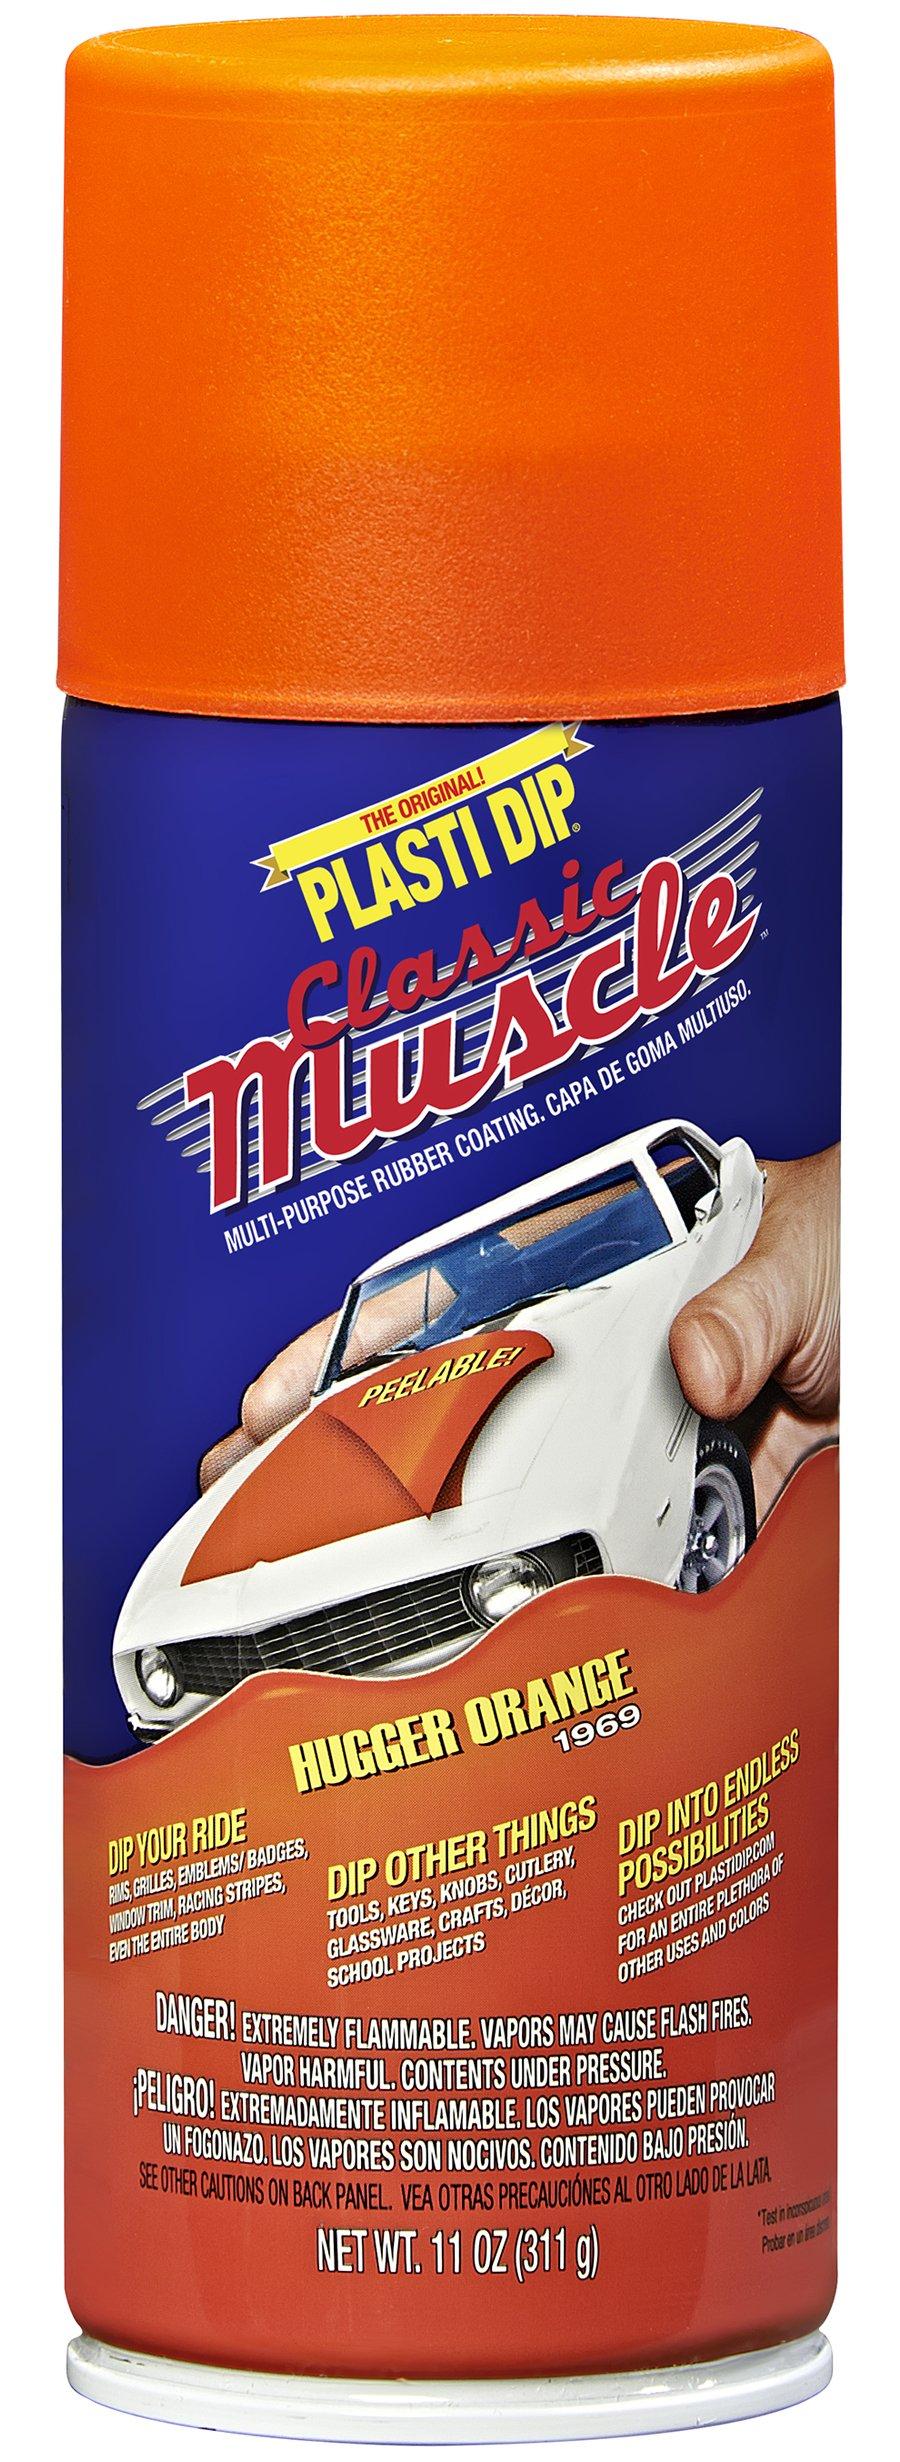 Performix 11307-6 Hugger Orange Classic Muscle Car Rubber Coating, 11 oz, 6 Pack